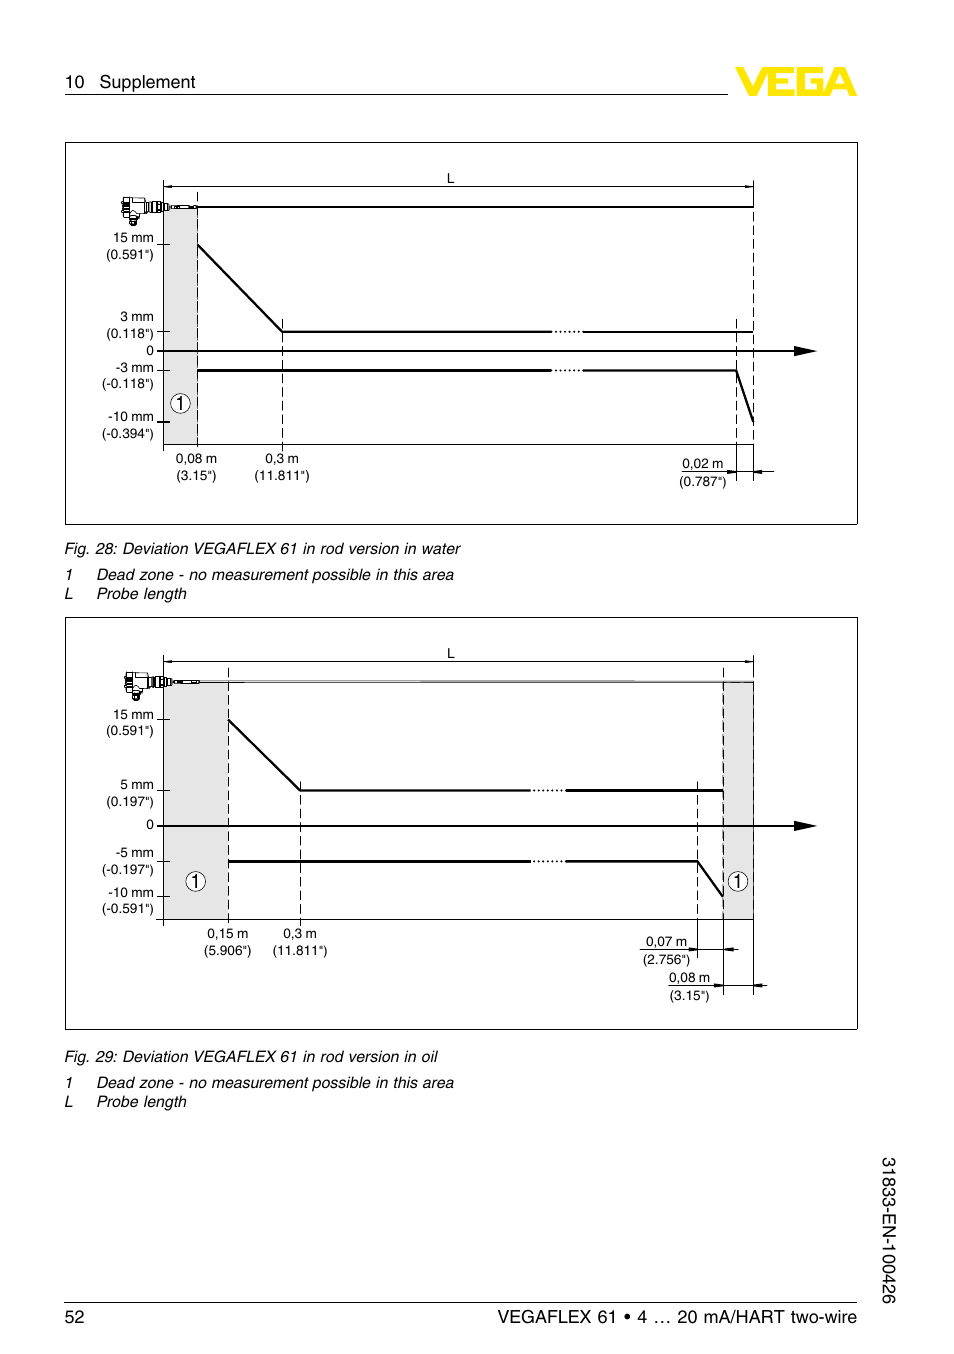 Vega vegaflex 61 4 … 20 ma_hart two-wire user manual | page 17 / 64.